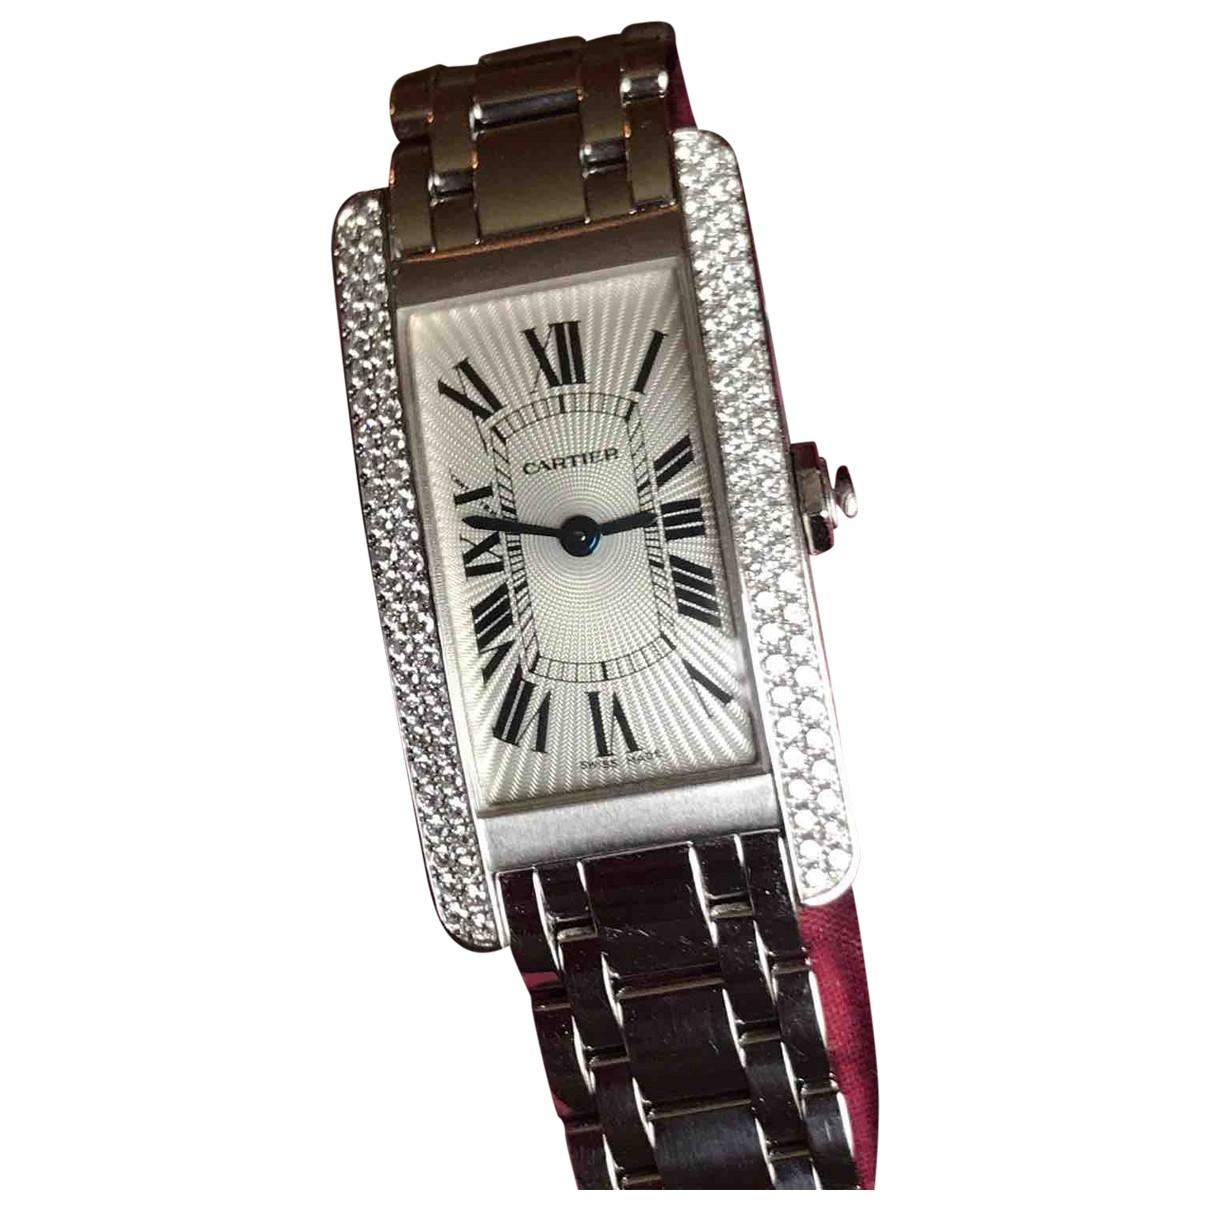 Cartier Tank Americaine Uhr in  Weiss Weissgold